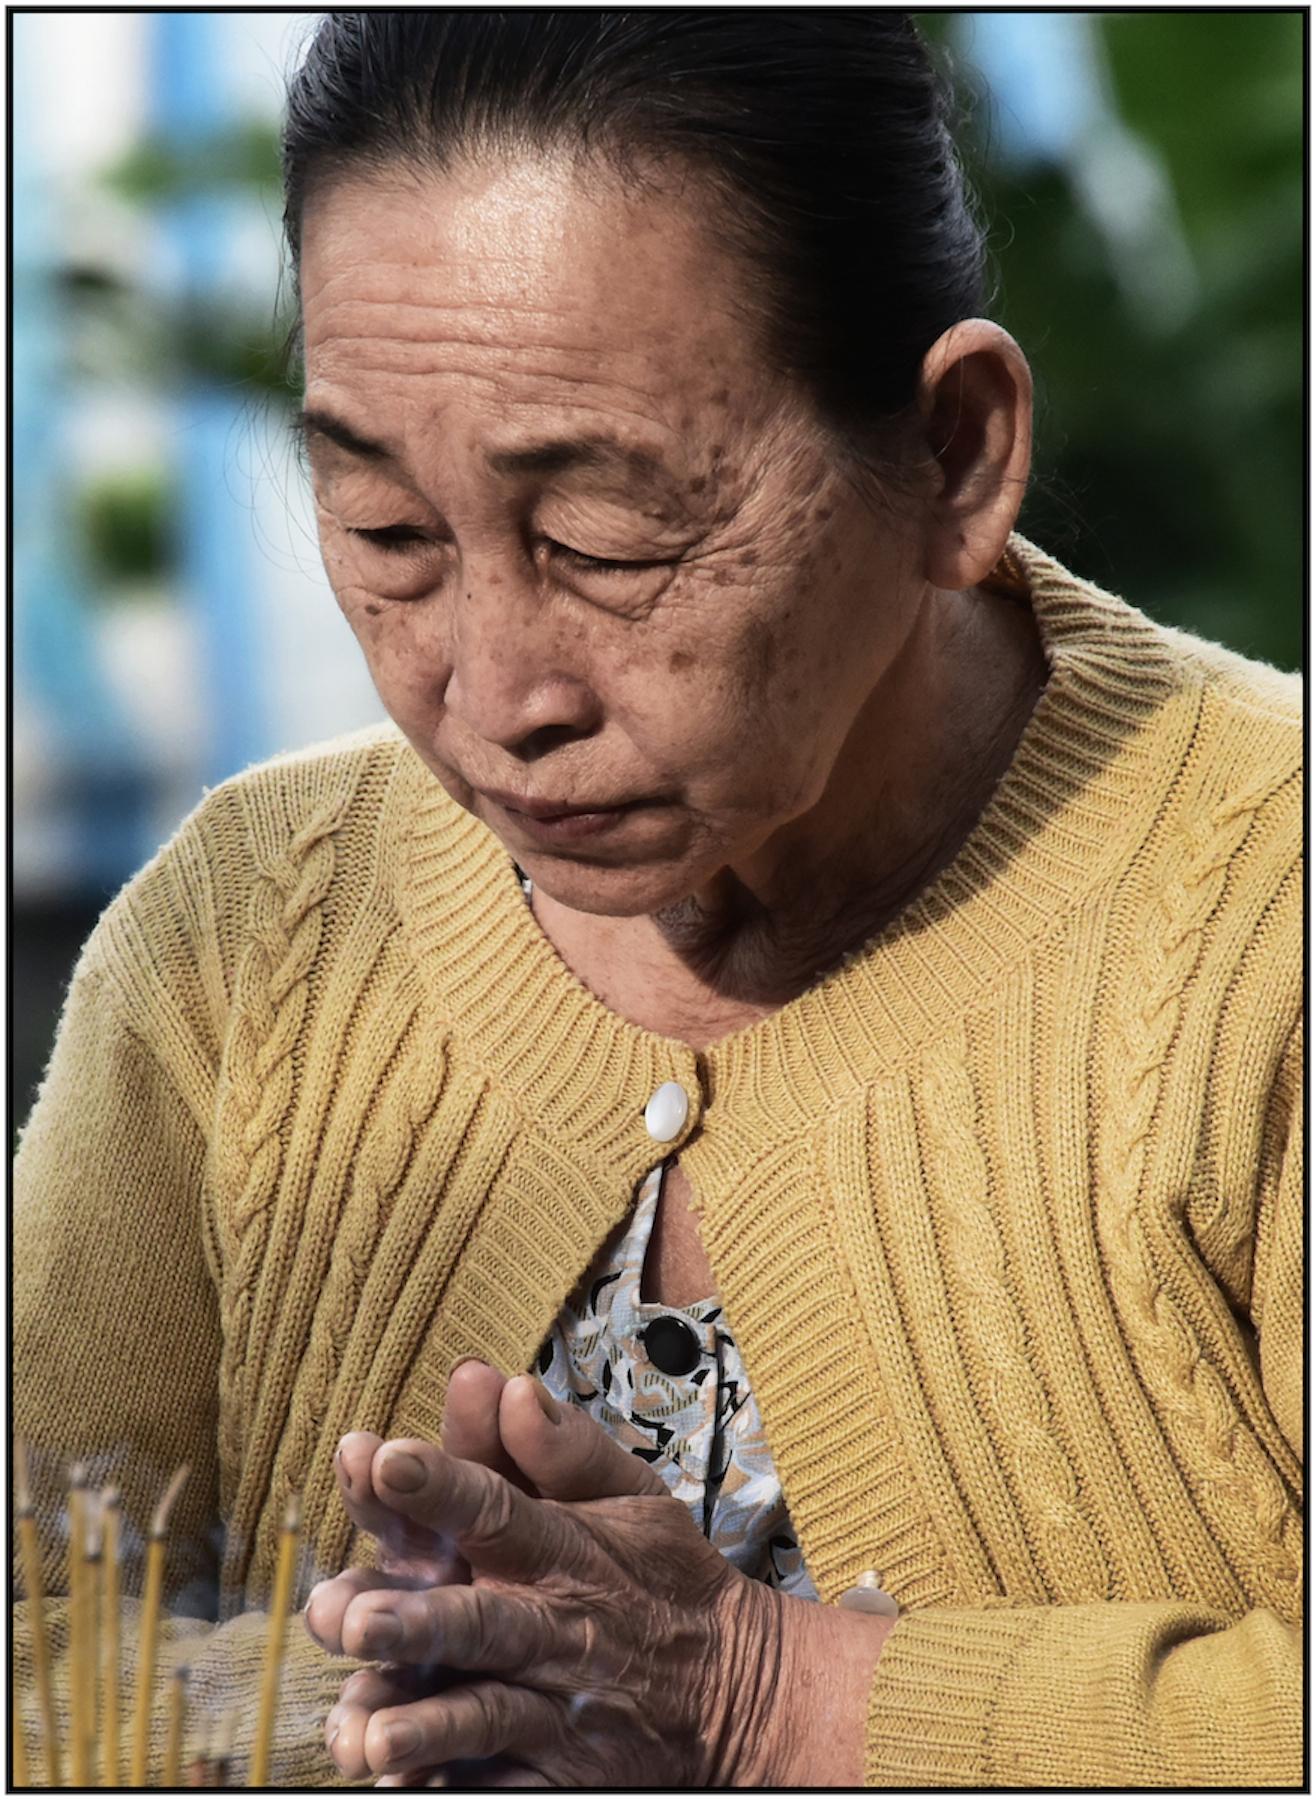 Woman prays at Ho Chi Minh shrine, Binh Tay Market, Cholon, Saigon/HCMC, Dec. 2015. #3967